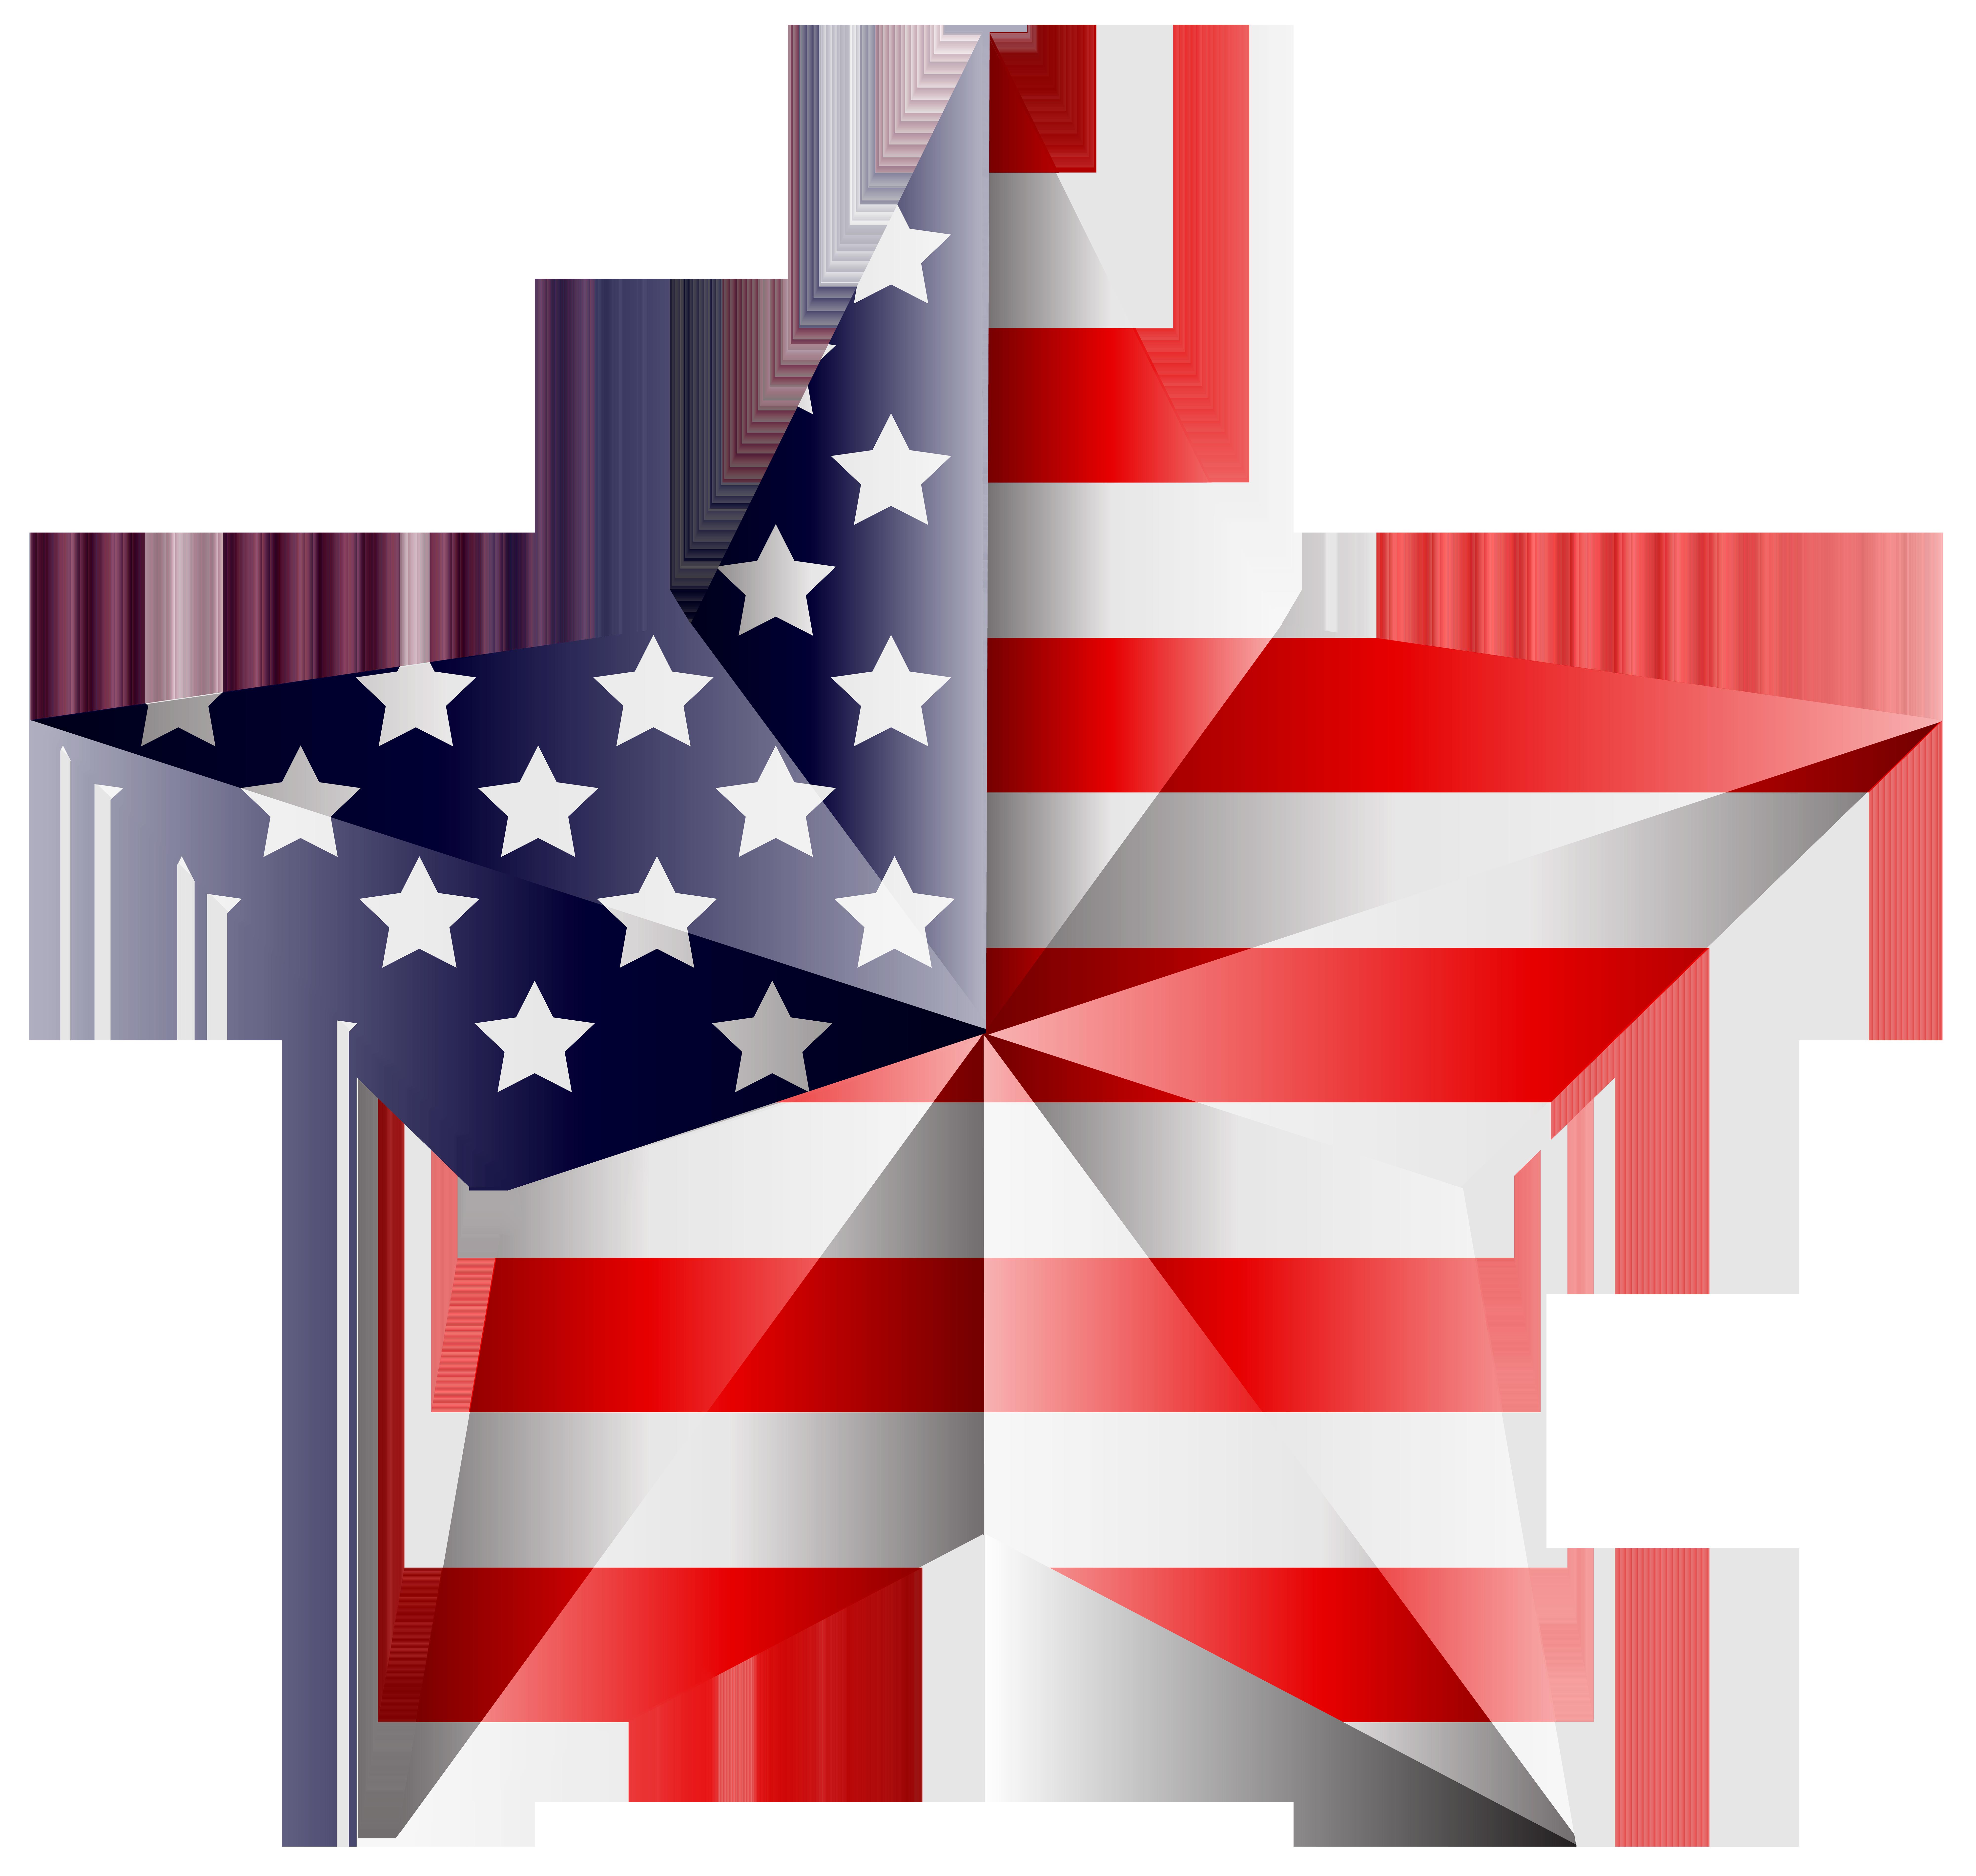 Free America Stars Cliparts, Download Free Clip Art, Free Clip Art.